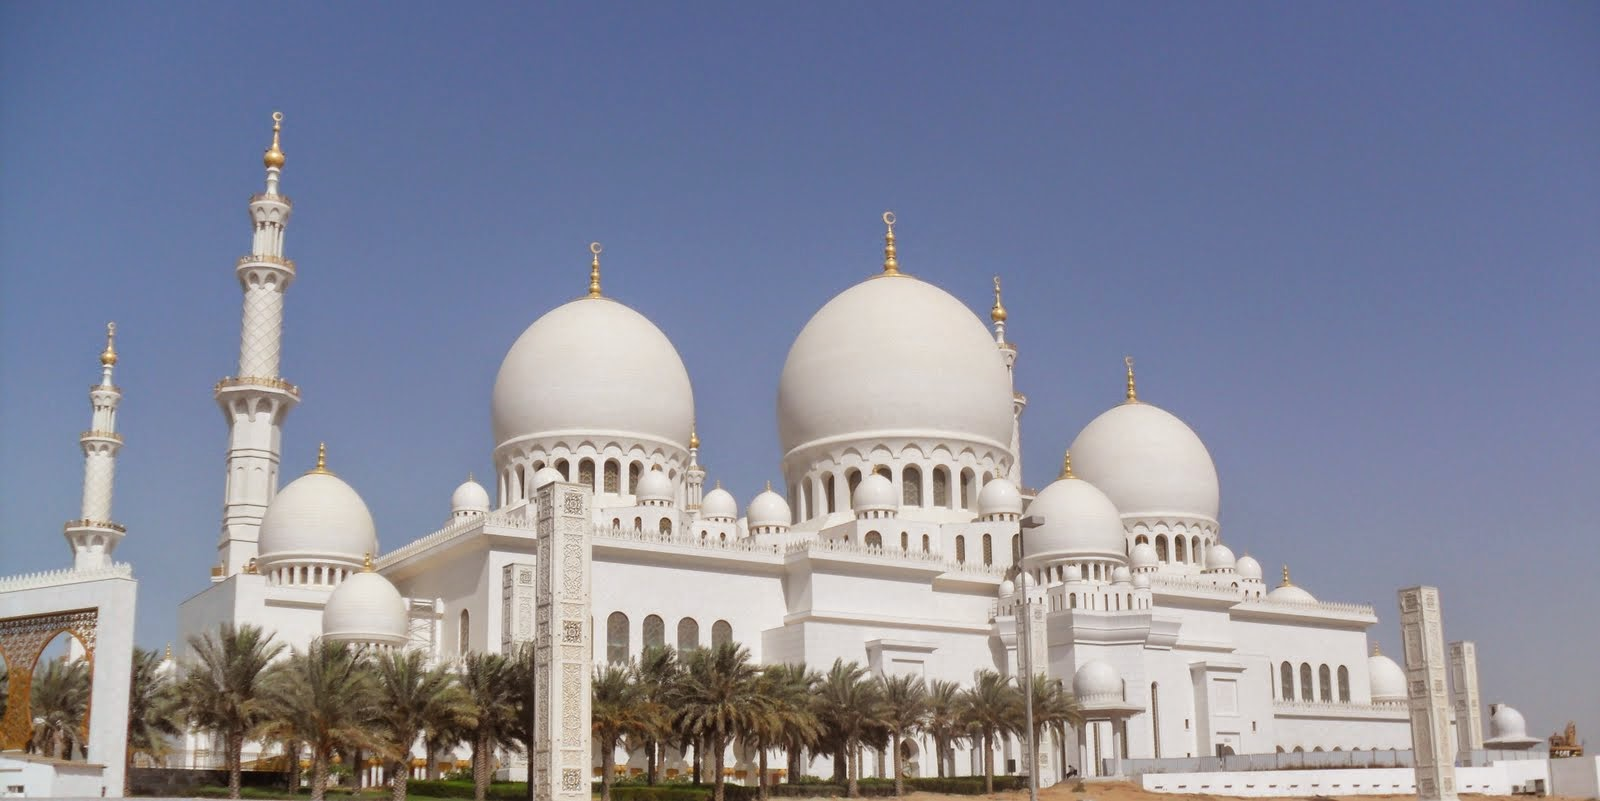 Abu Dhabi Grand Mosque Hd Wallpapers Fashionip